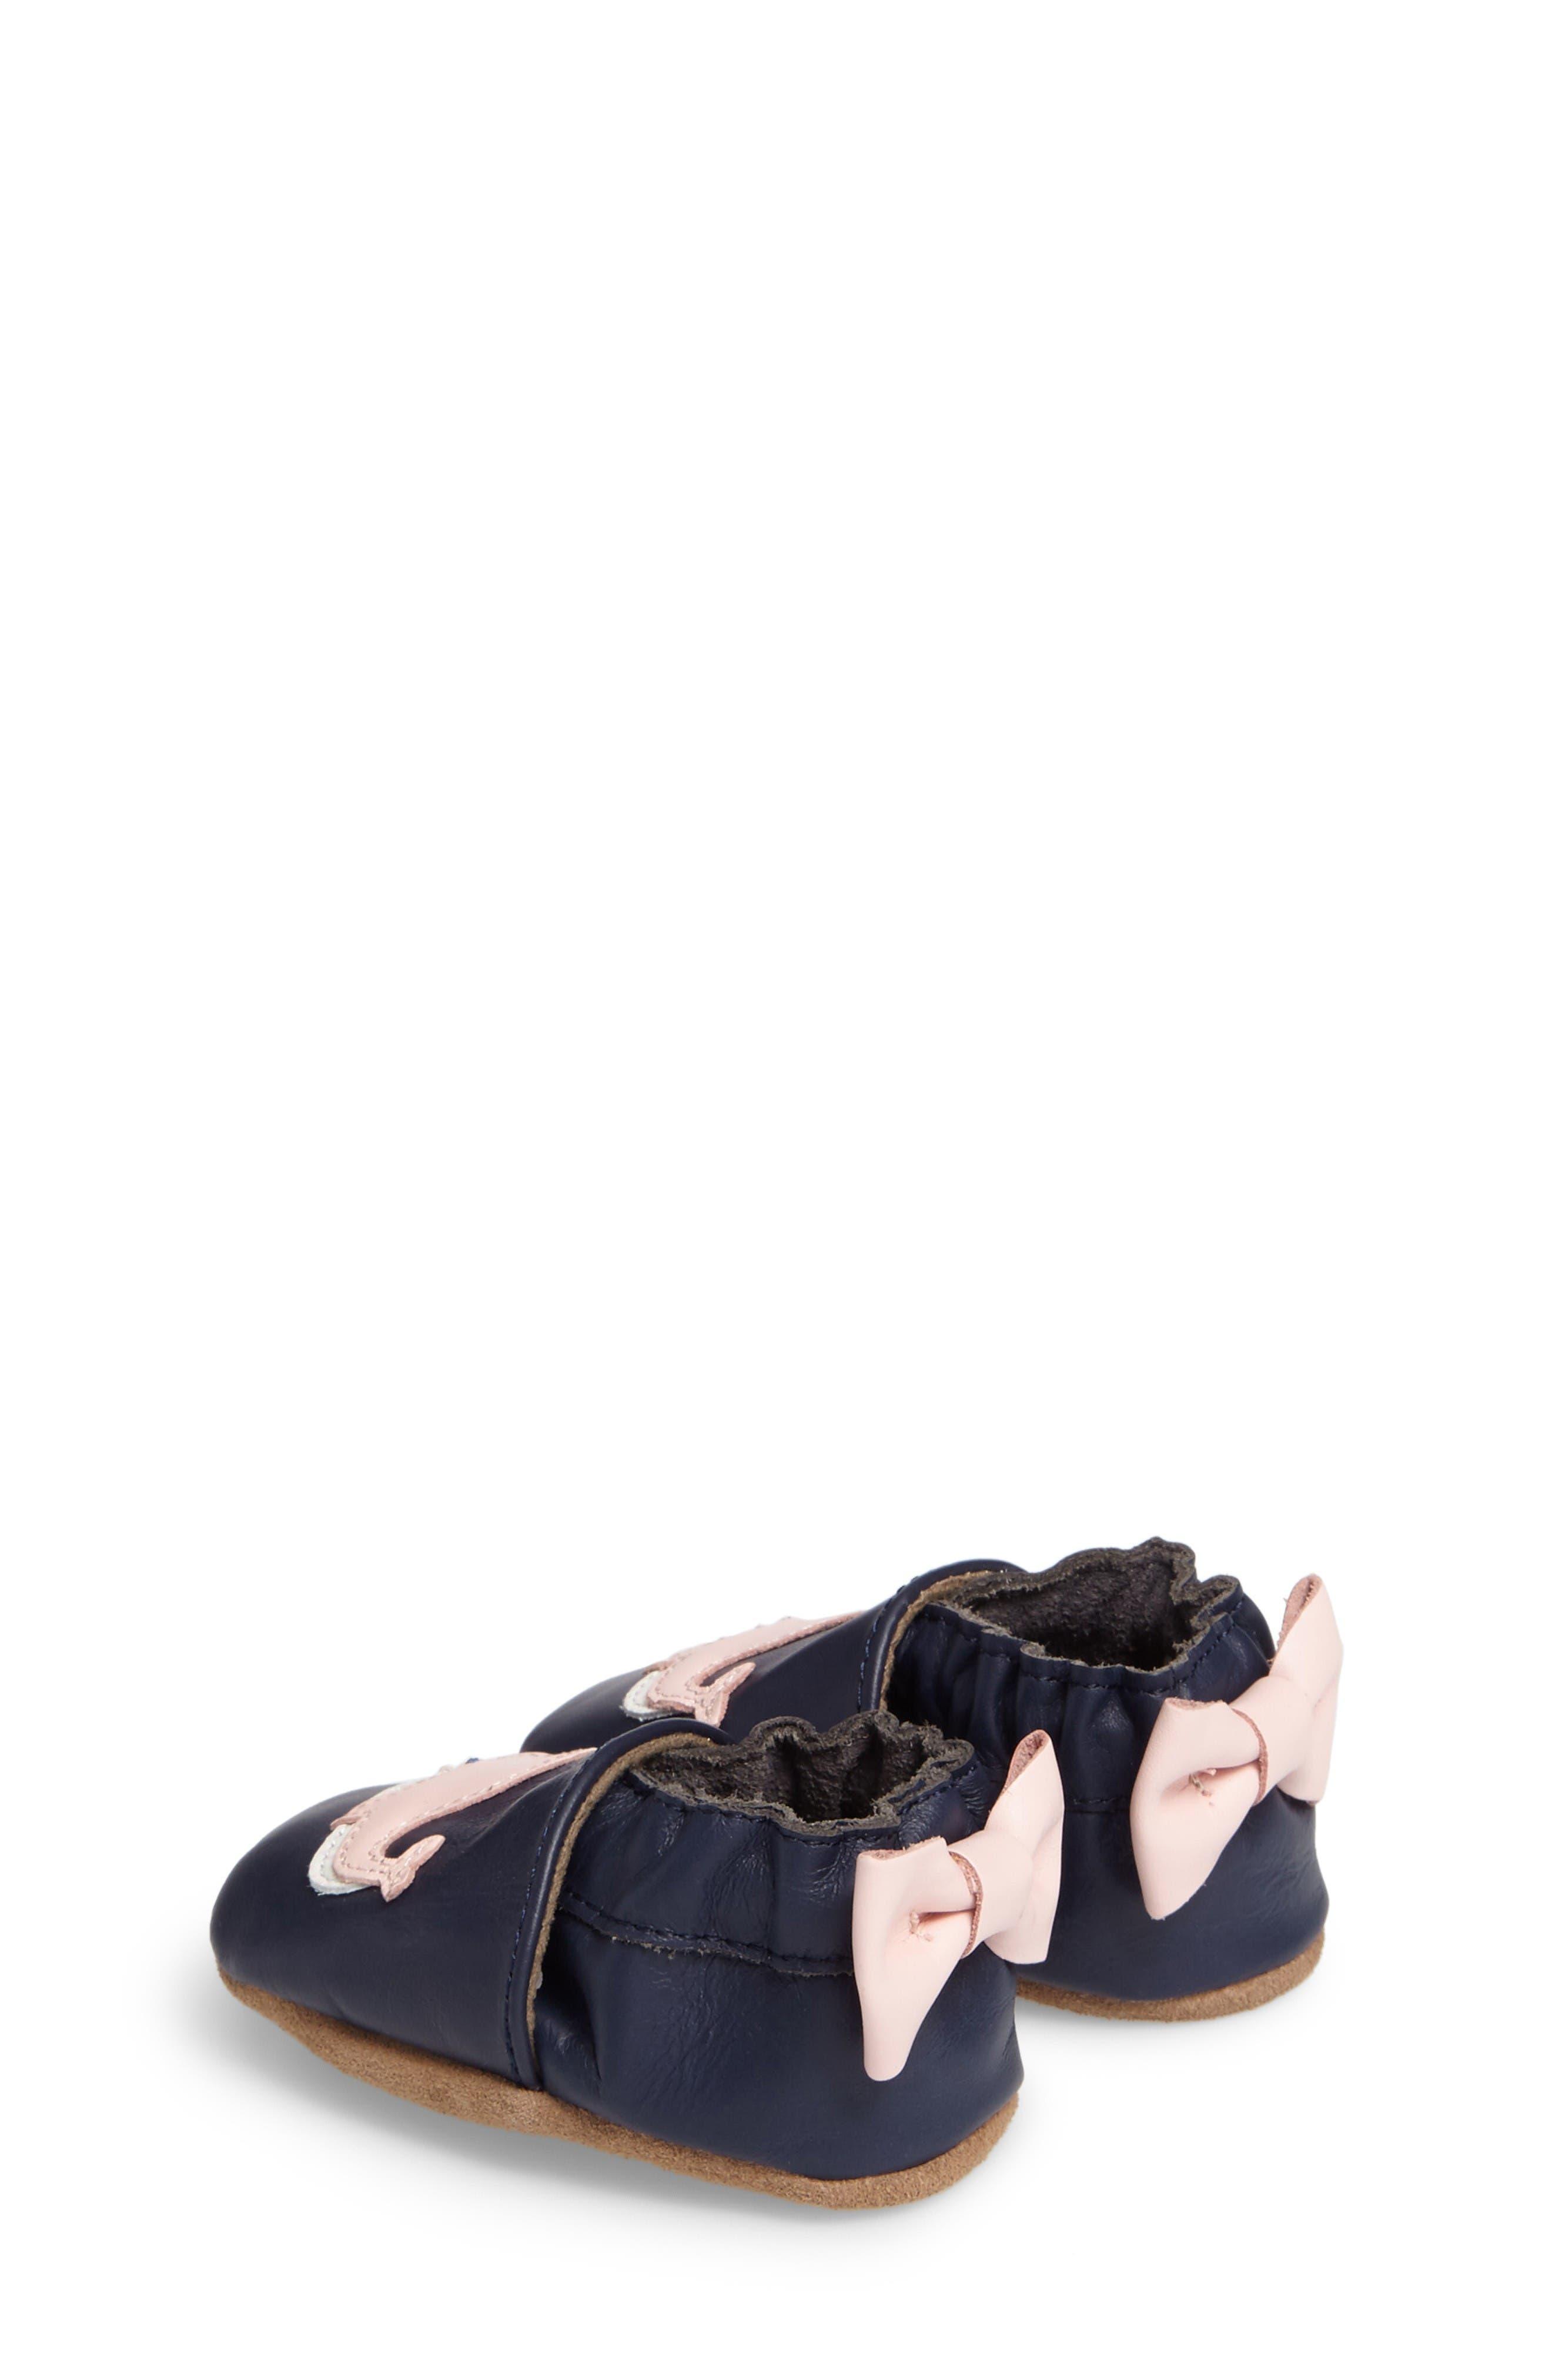 Winnie the Whale Crib Shoe,                             Alternate thumbnail 2, color,                             Navy